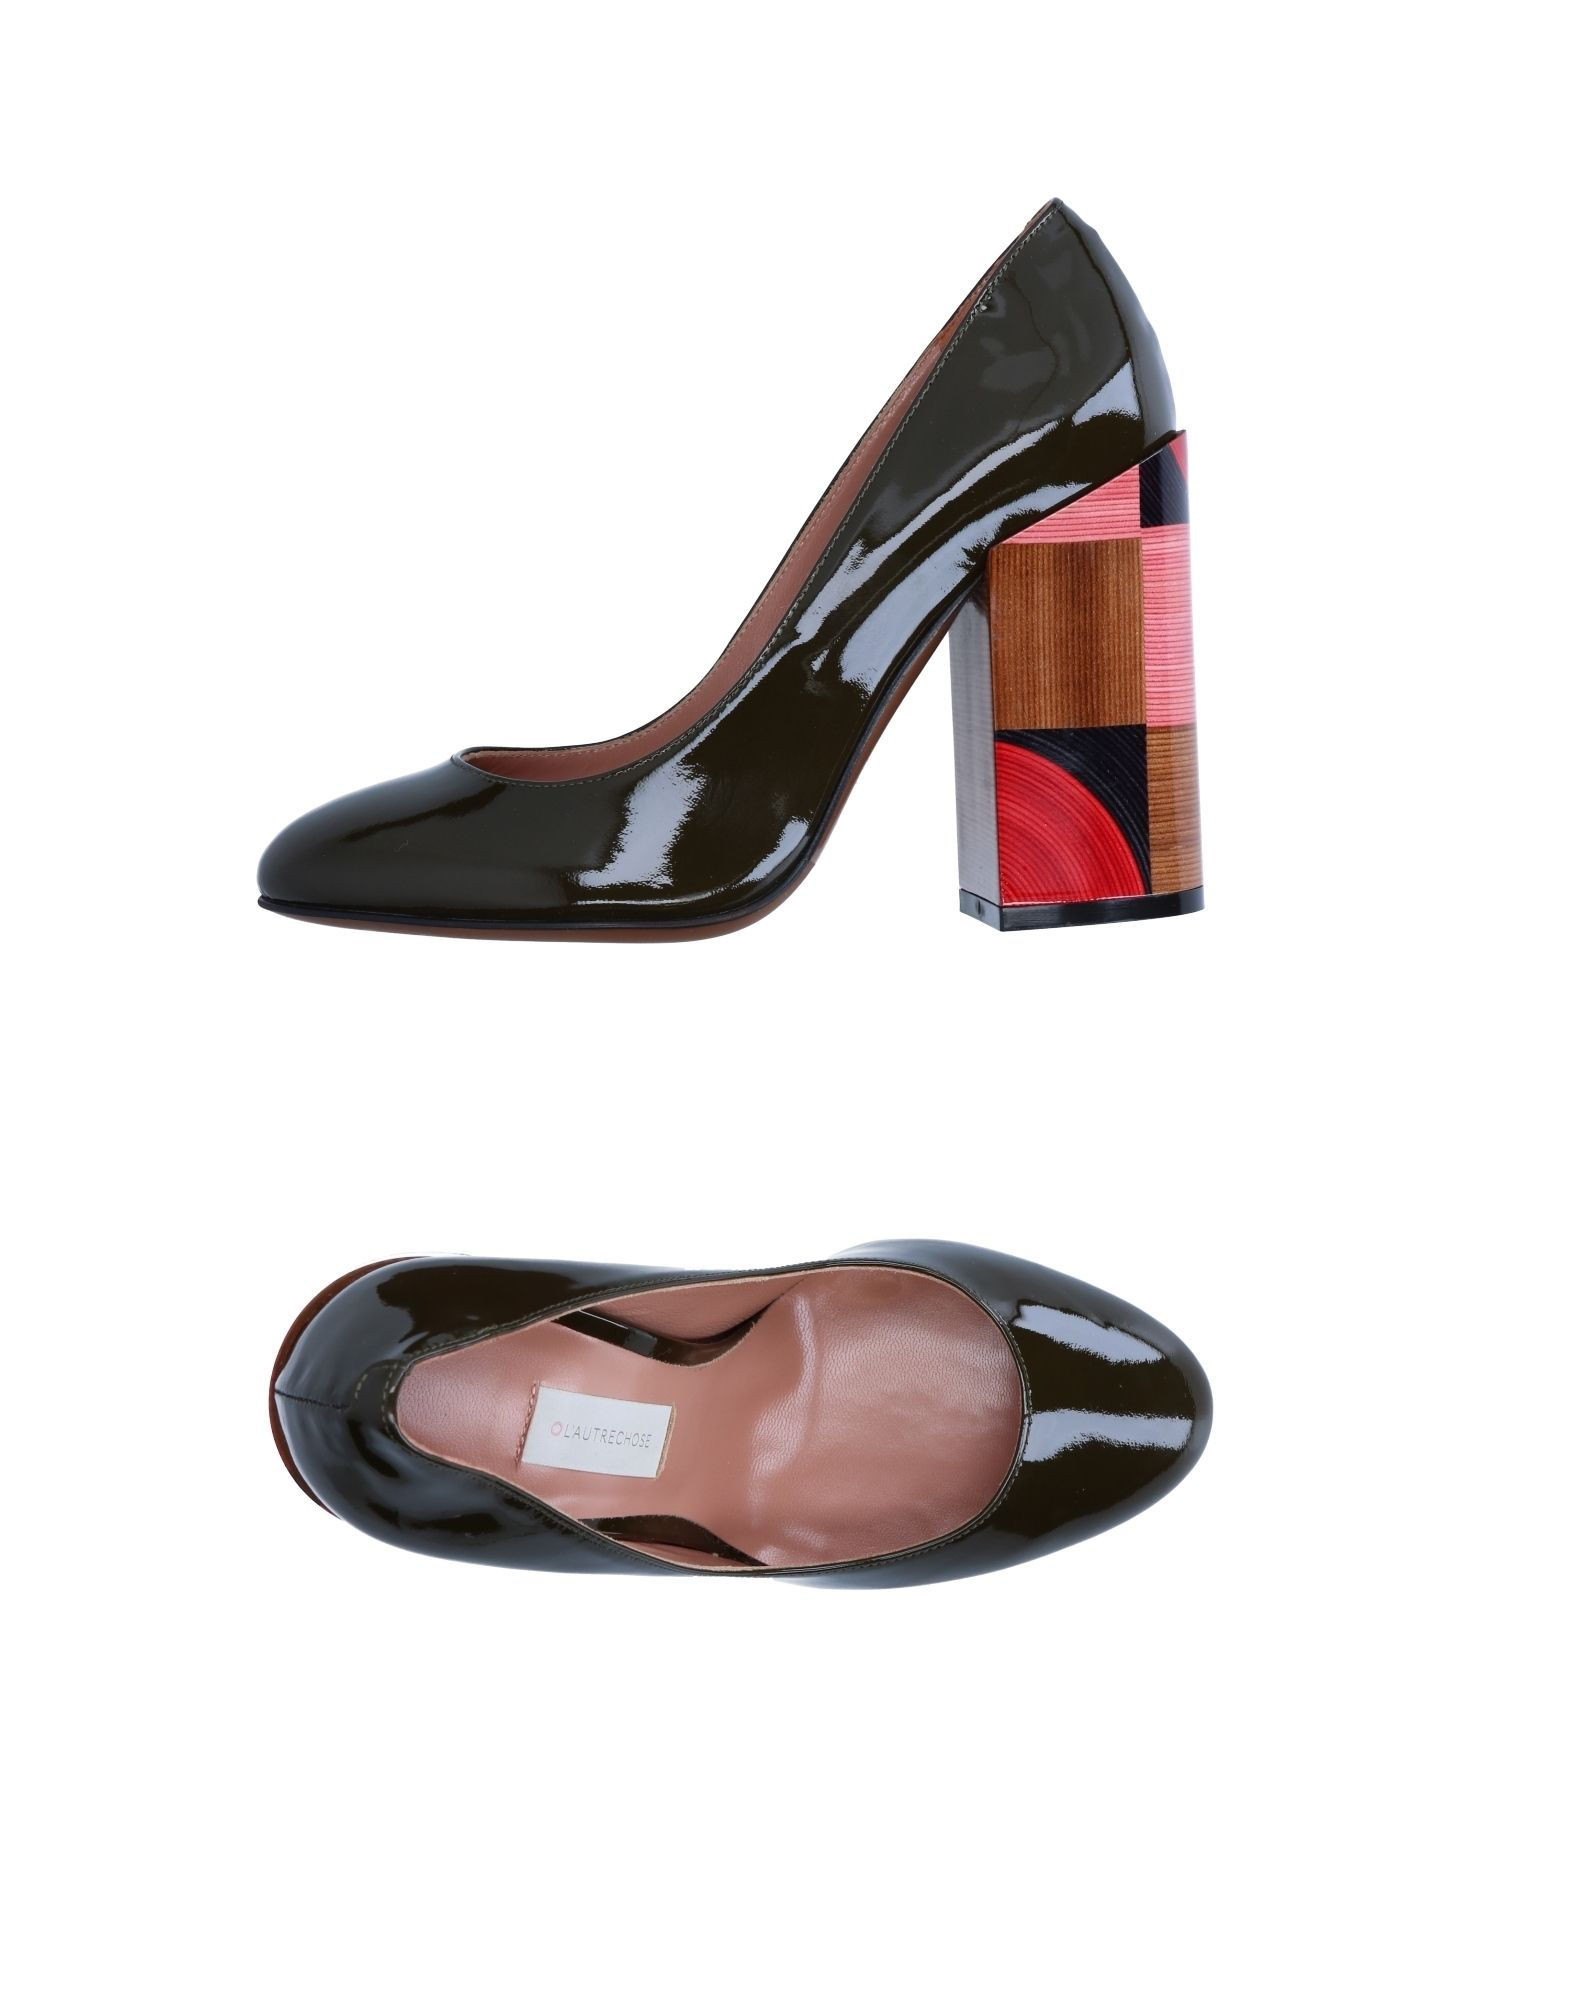 Rabatt Schuhe L' Autre Chose Pumps Damen  11256292UT